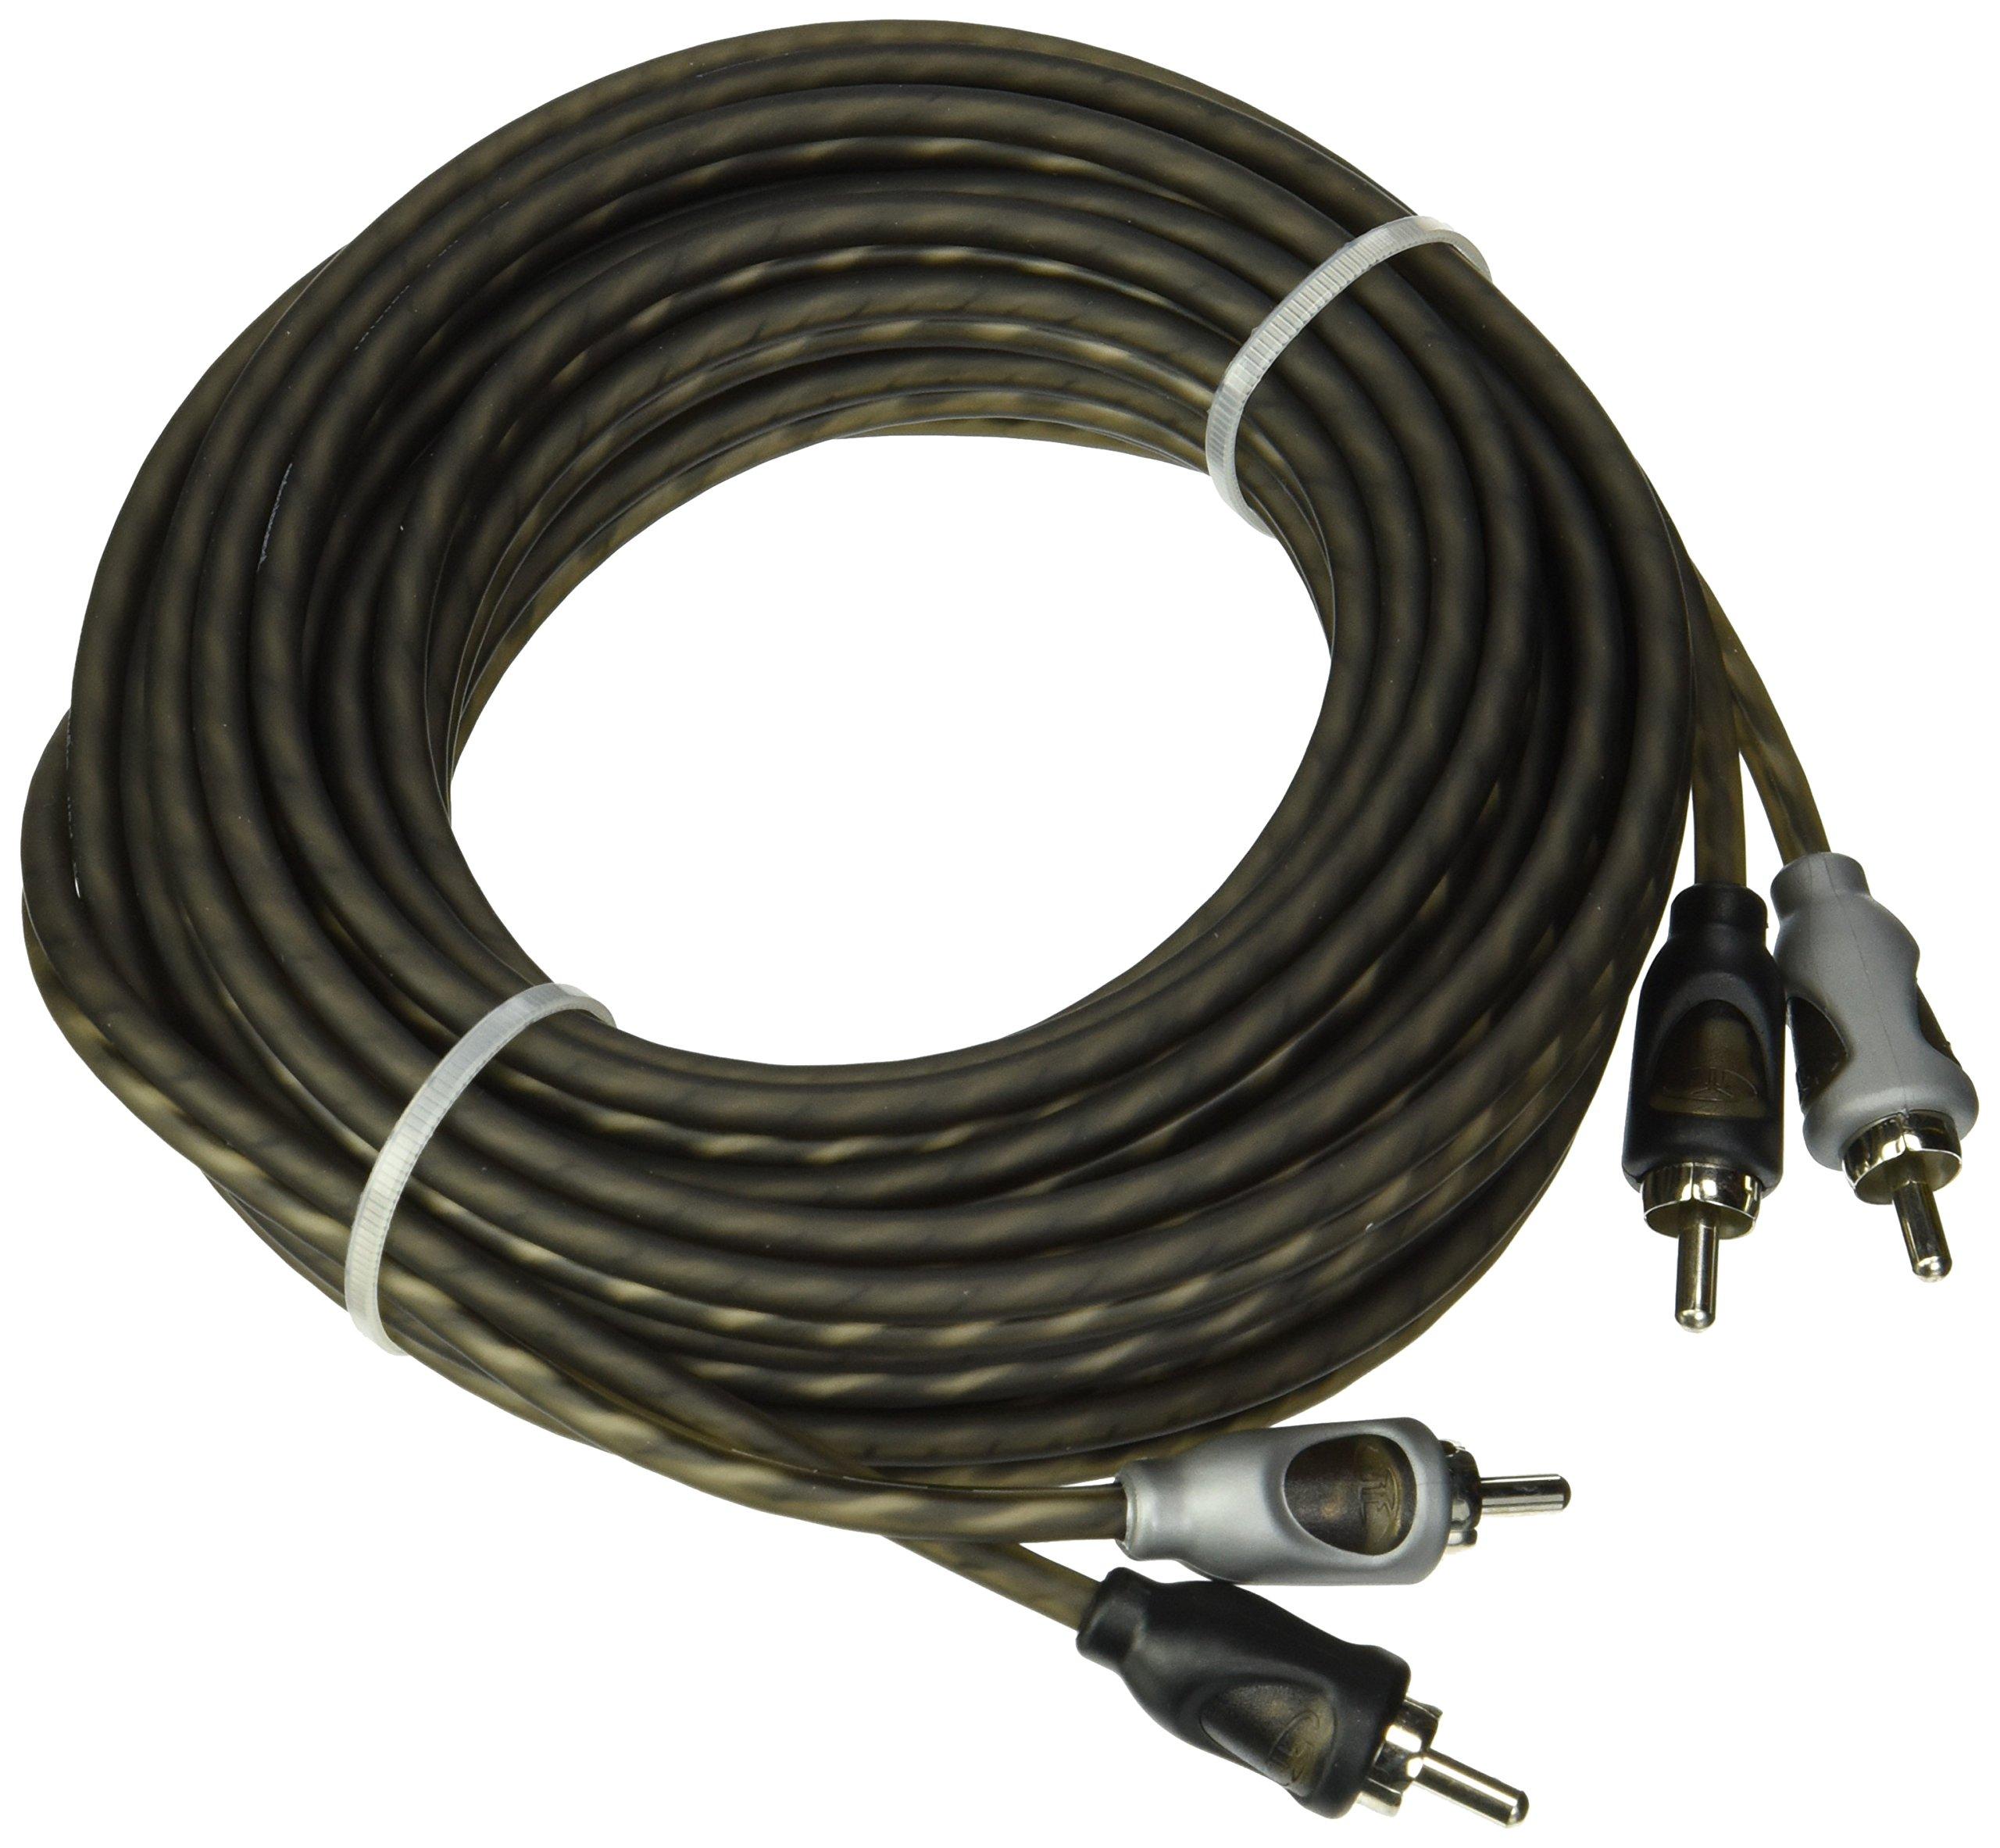 Rockford Fosgate Twisted Pair 20-Feet Signal Cable by Rockford Fosgate